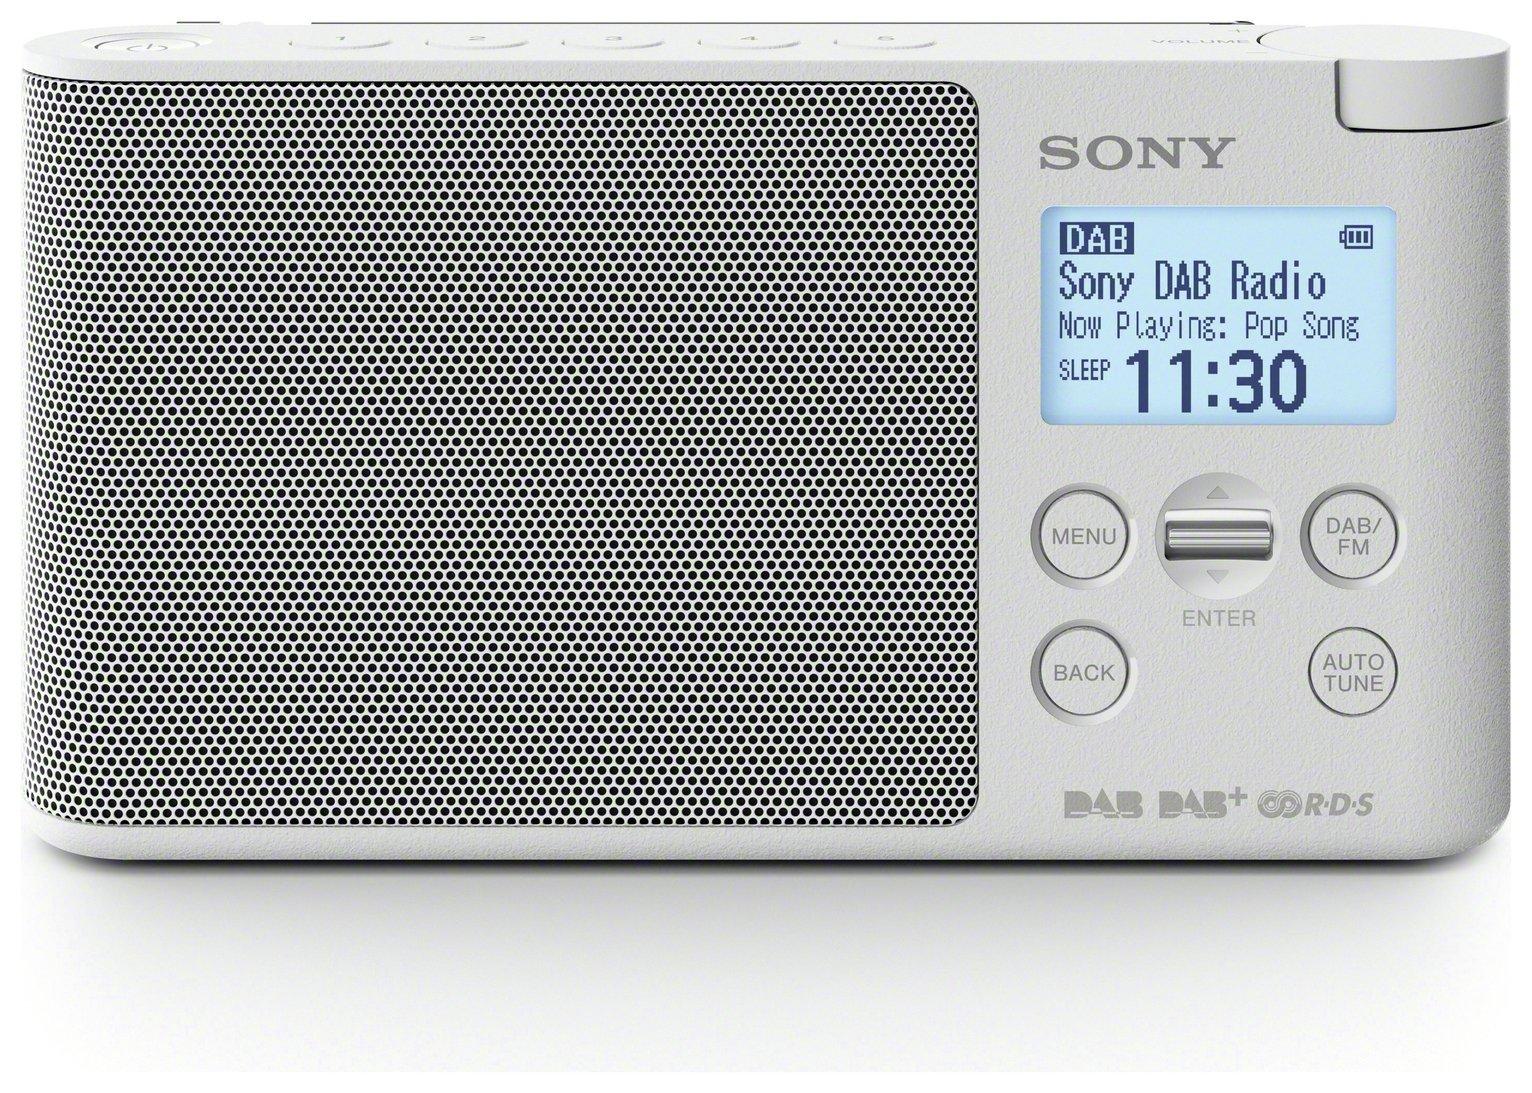 Sony DS41 DAB Radio - White